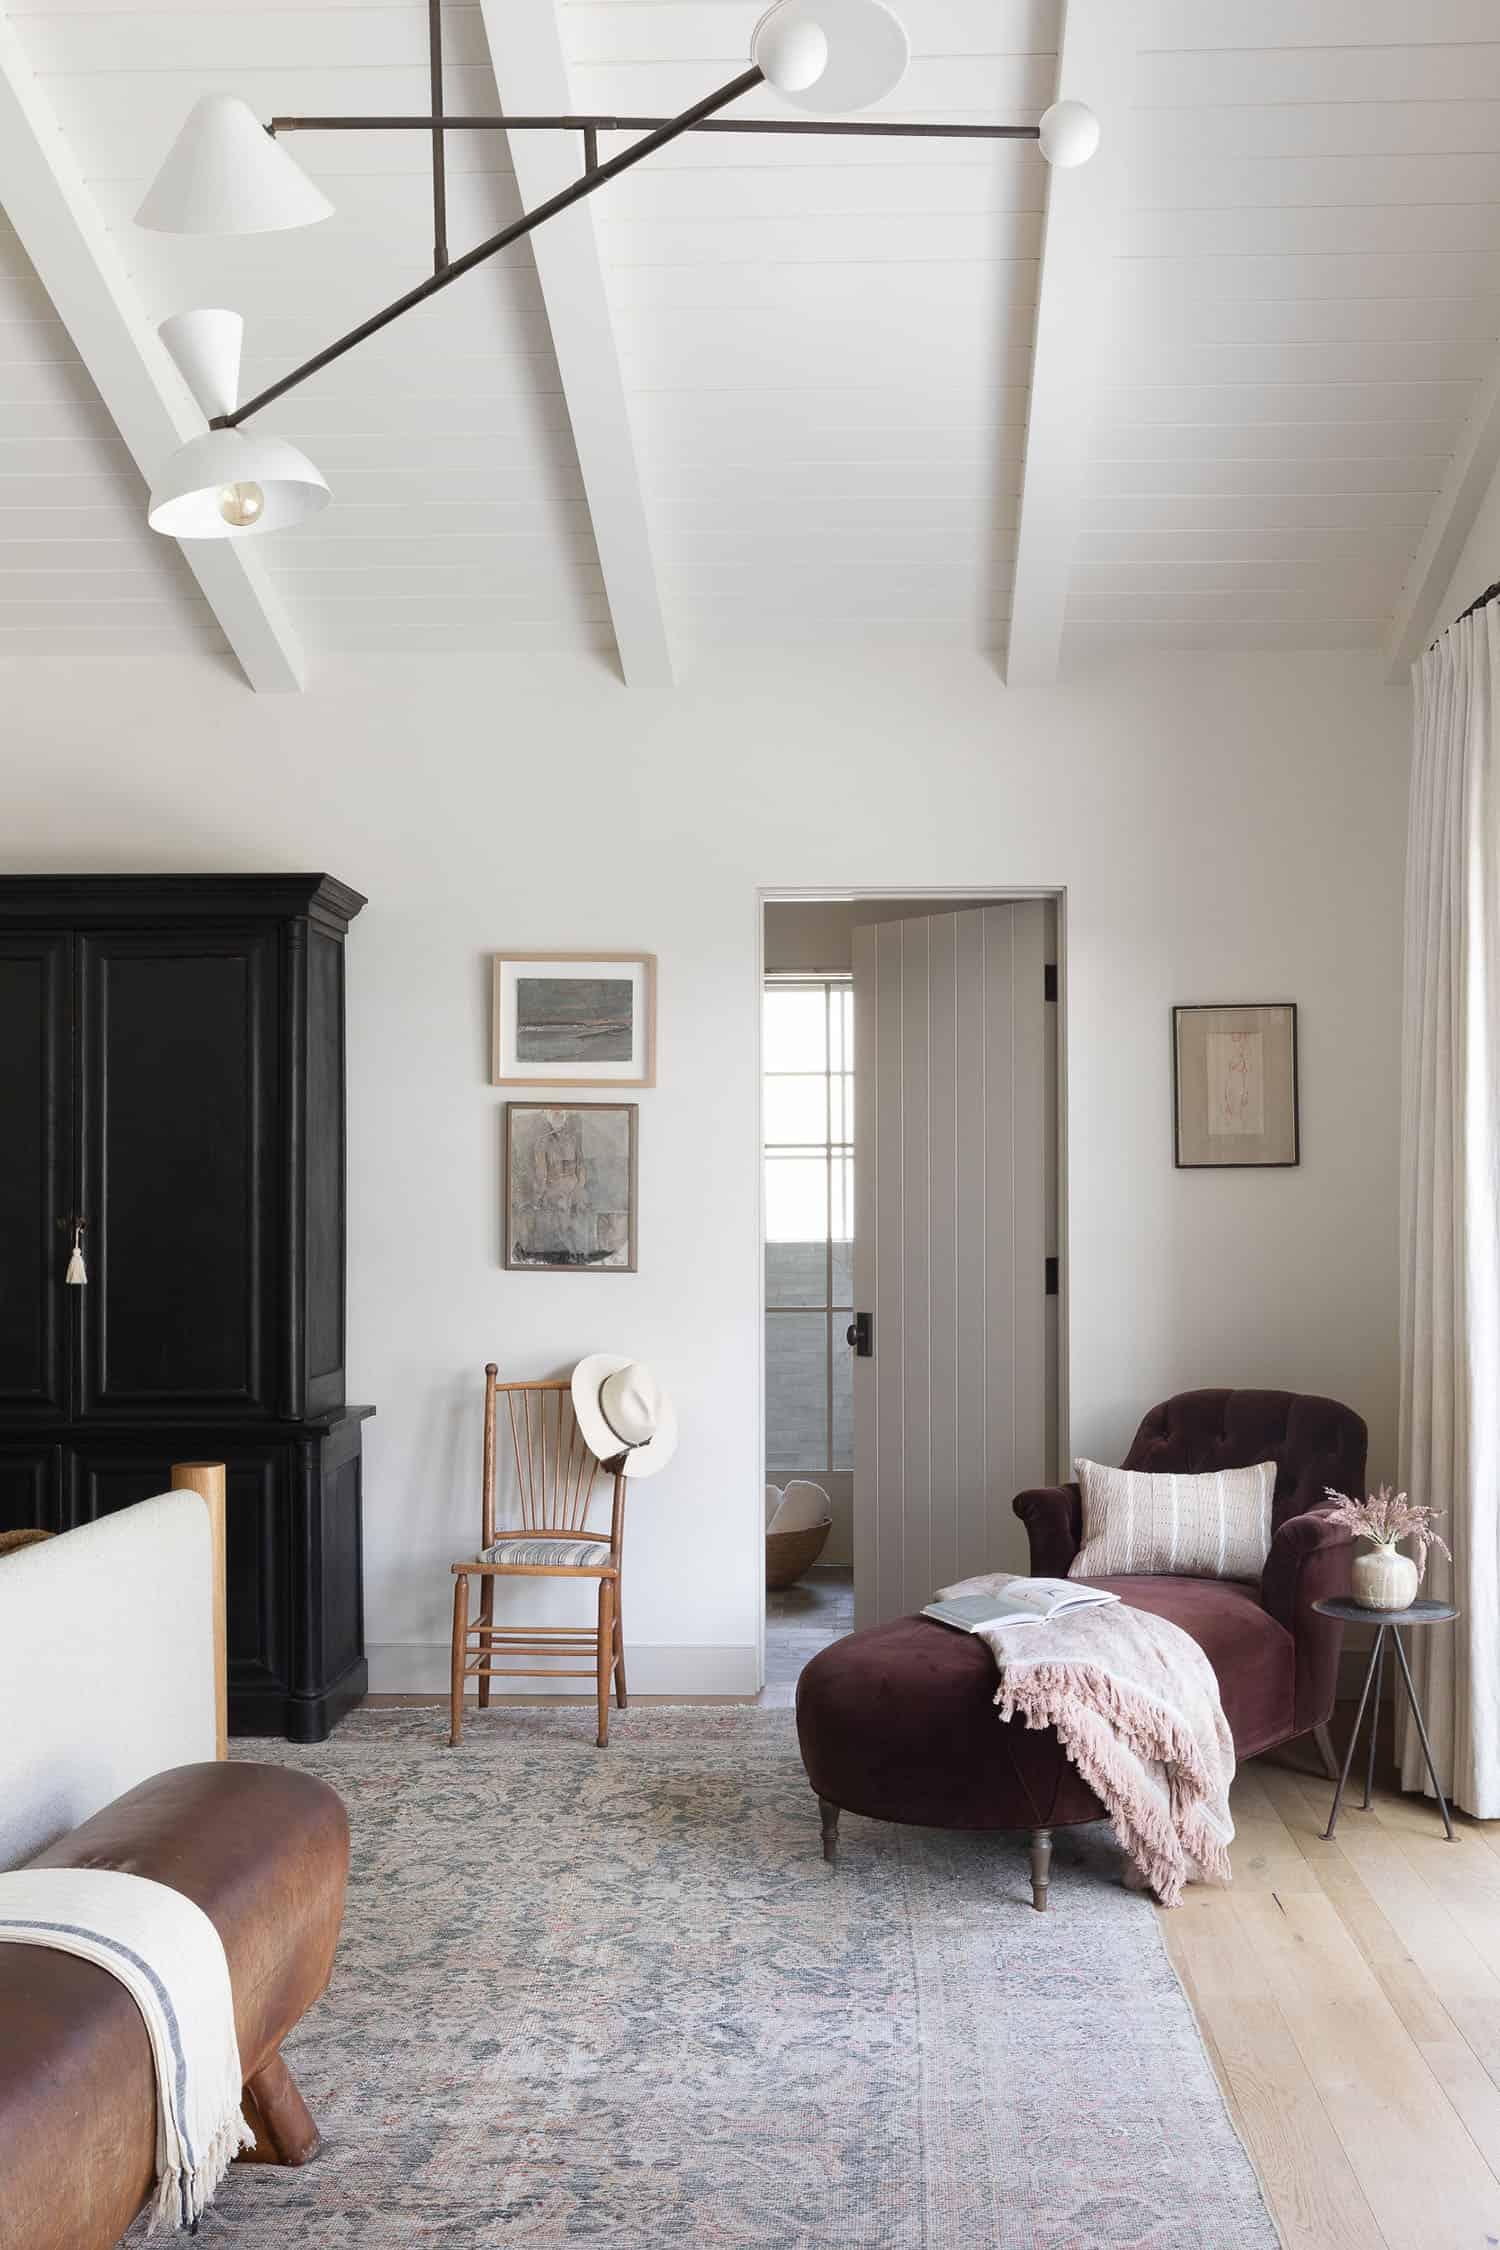 west-coast-style-bedroom